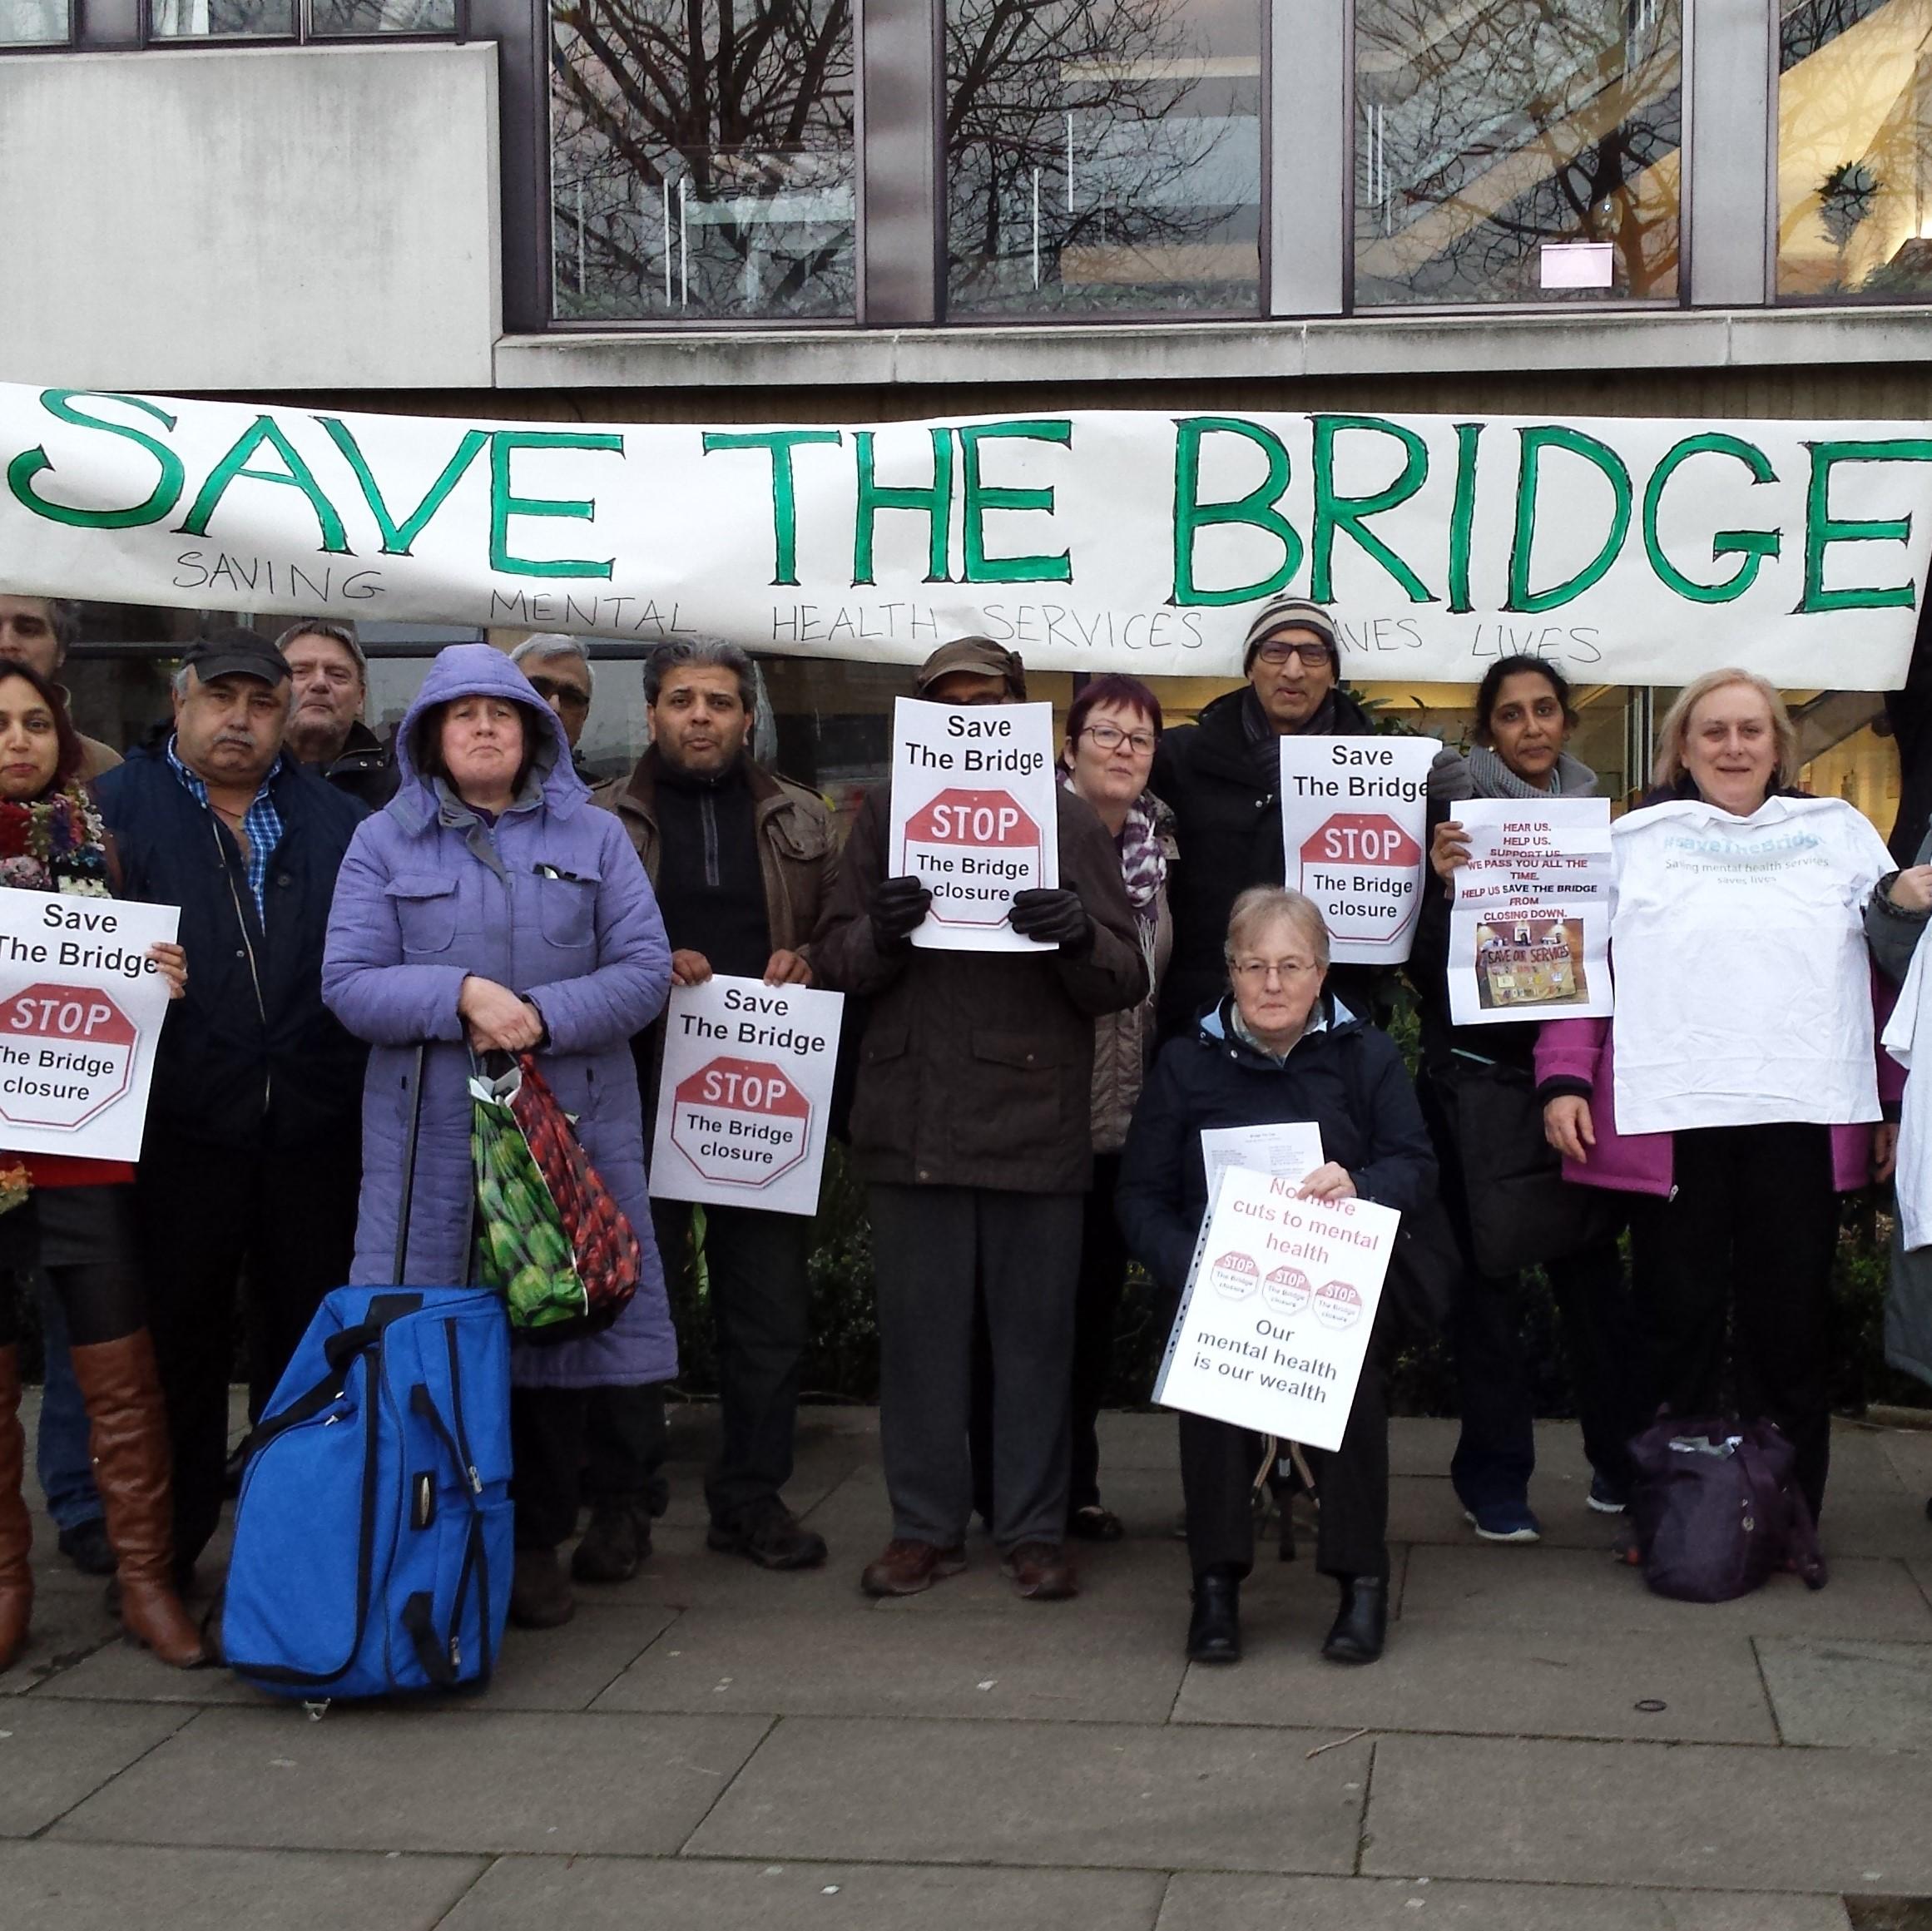 Save The Bridge sq.jpg